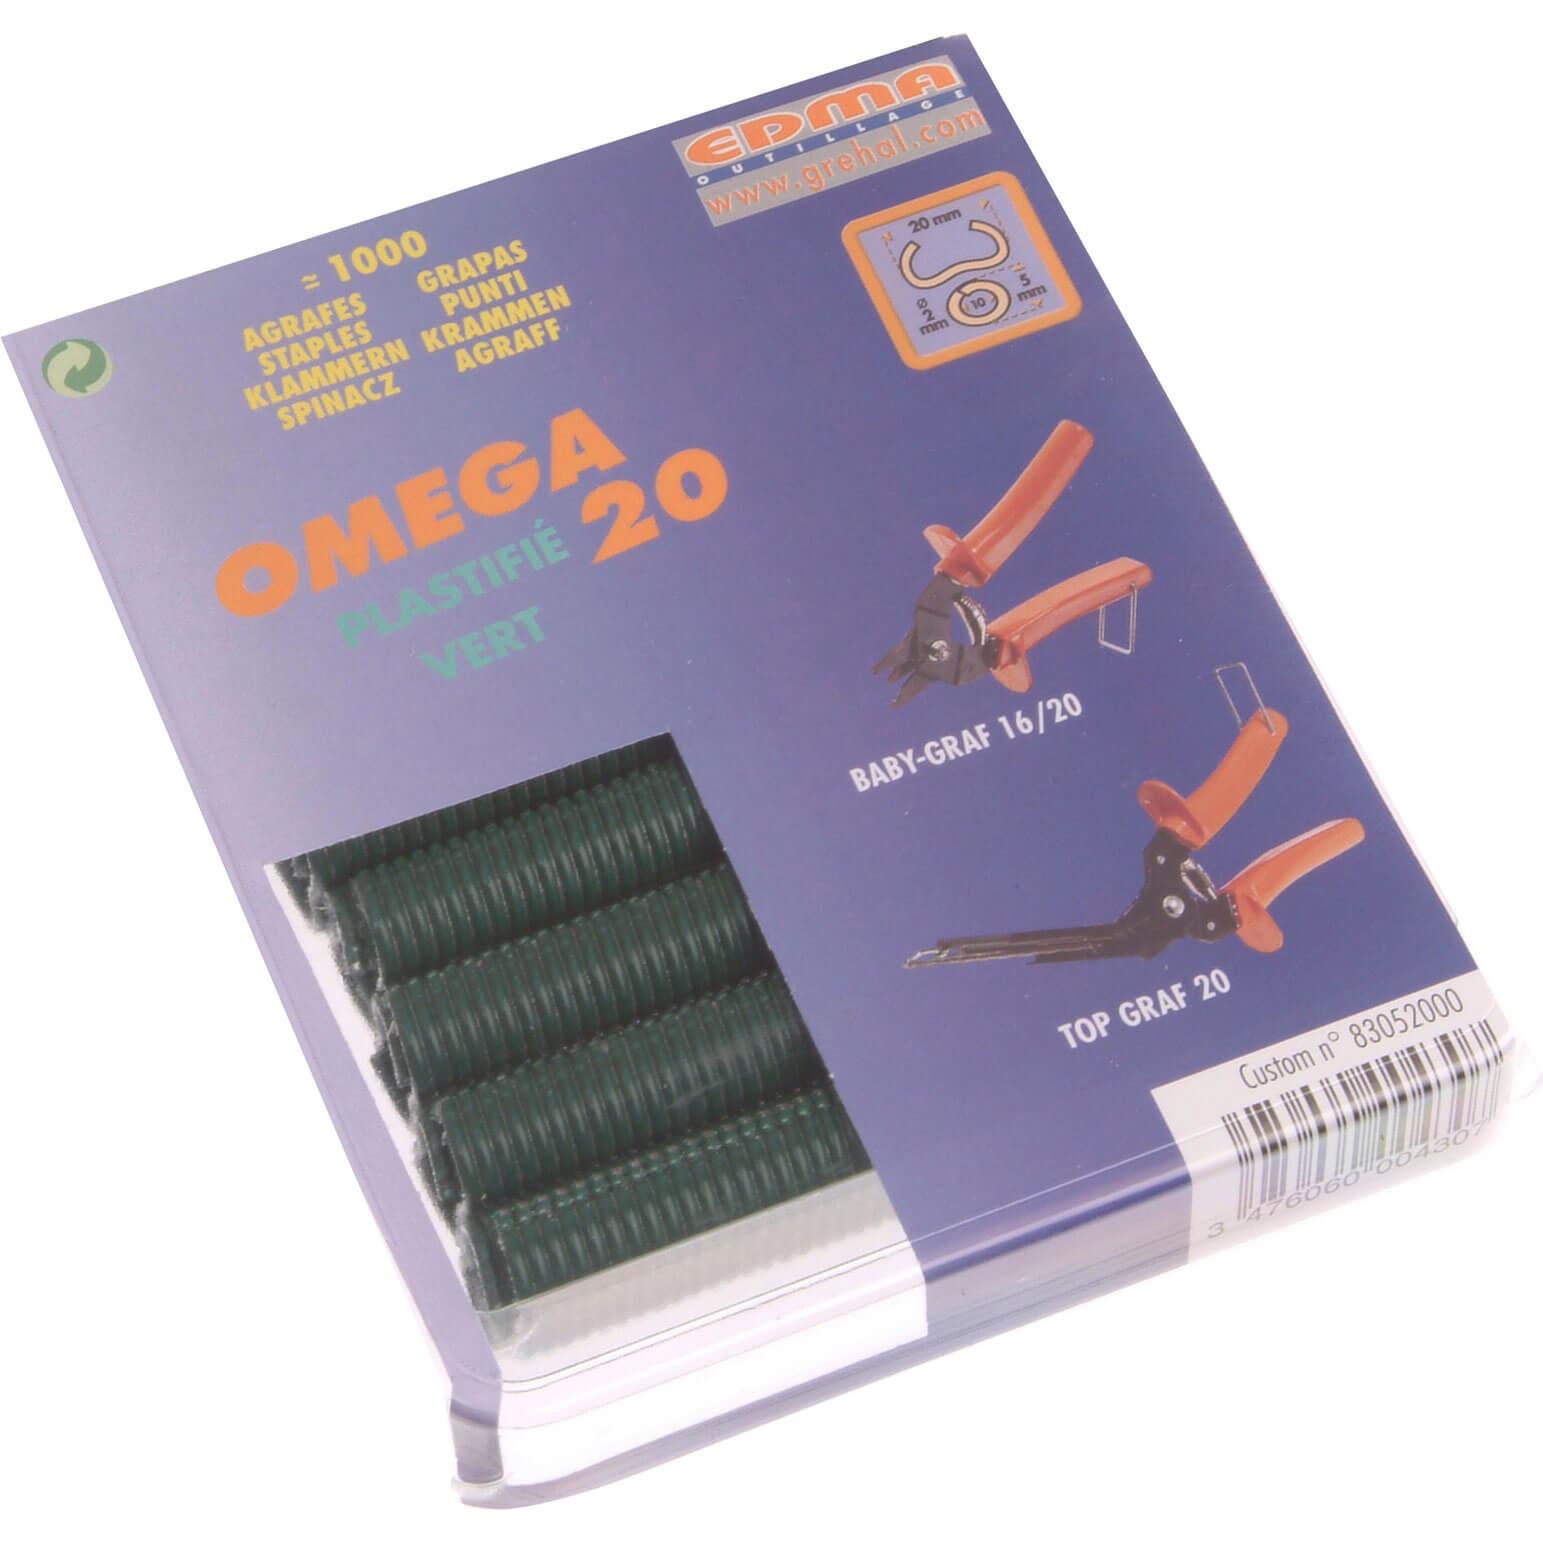 Image of Edma Green Coat Steel Hog Ring Omega Size 20 Pack of 1000